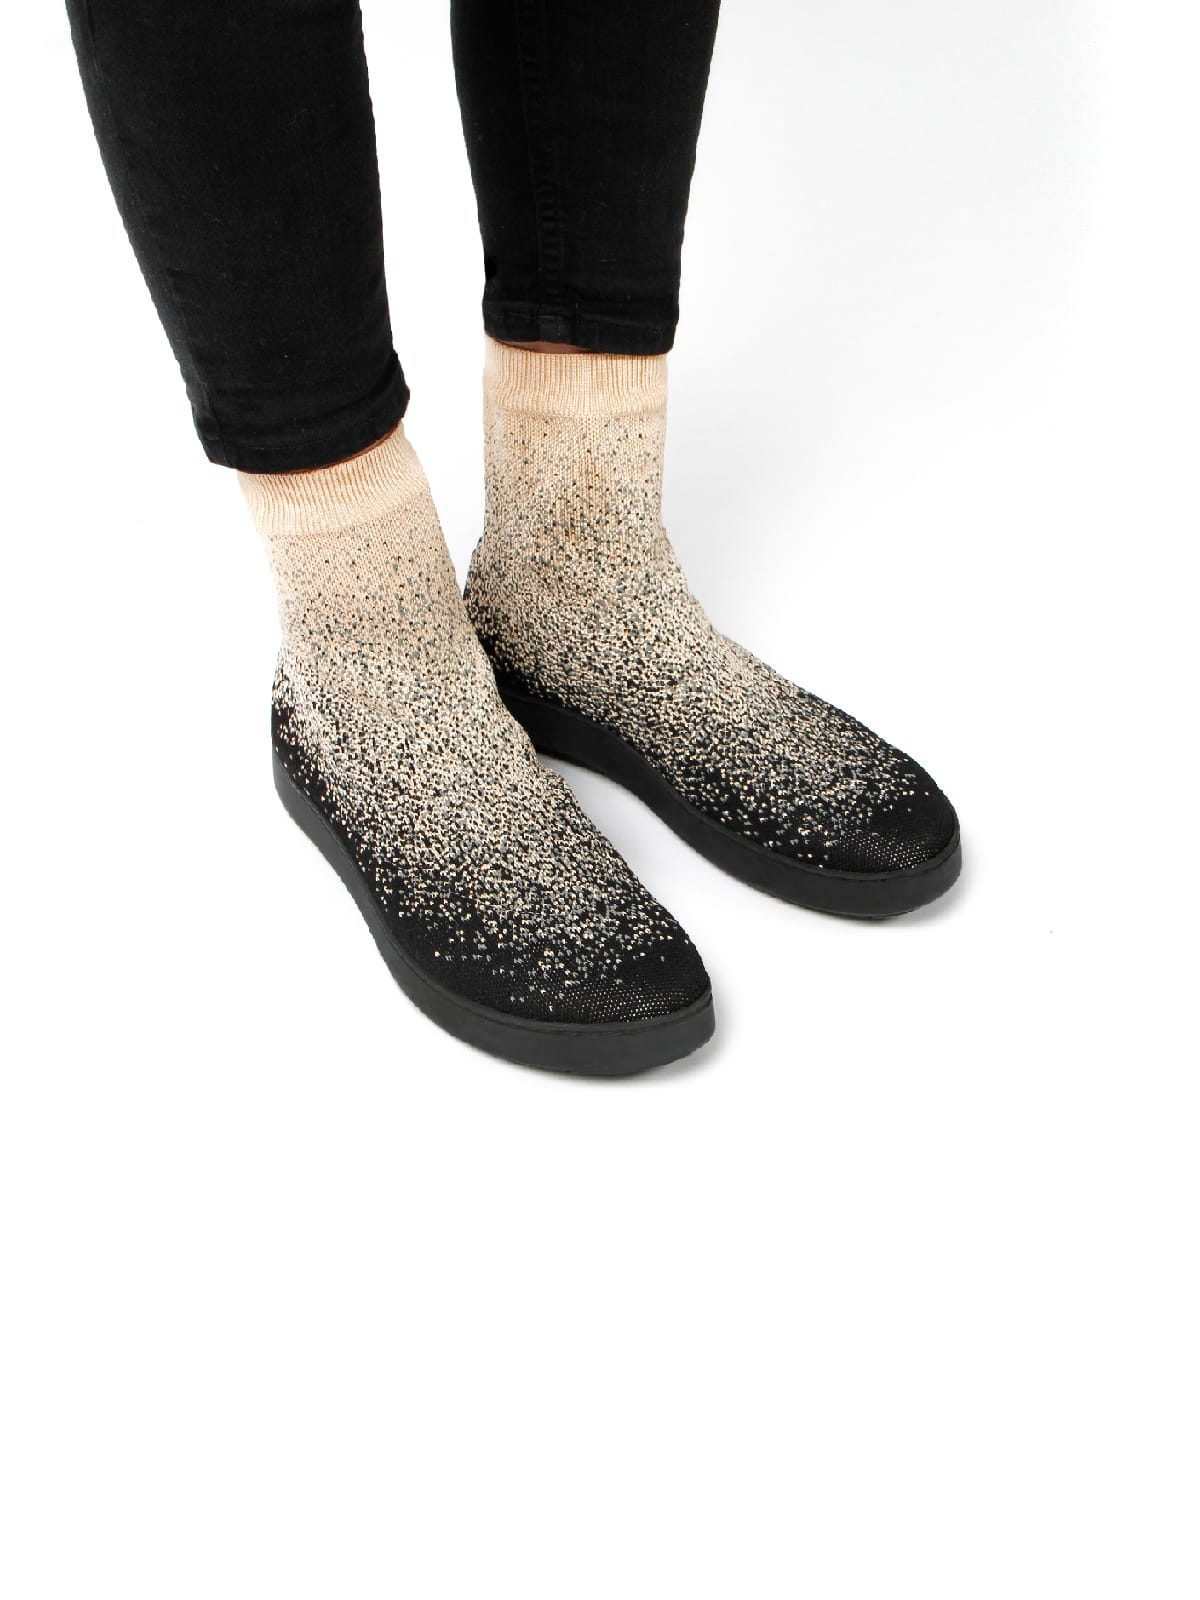 3D knitted sockboot Sparkle starry schräg K